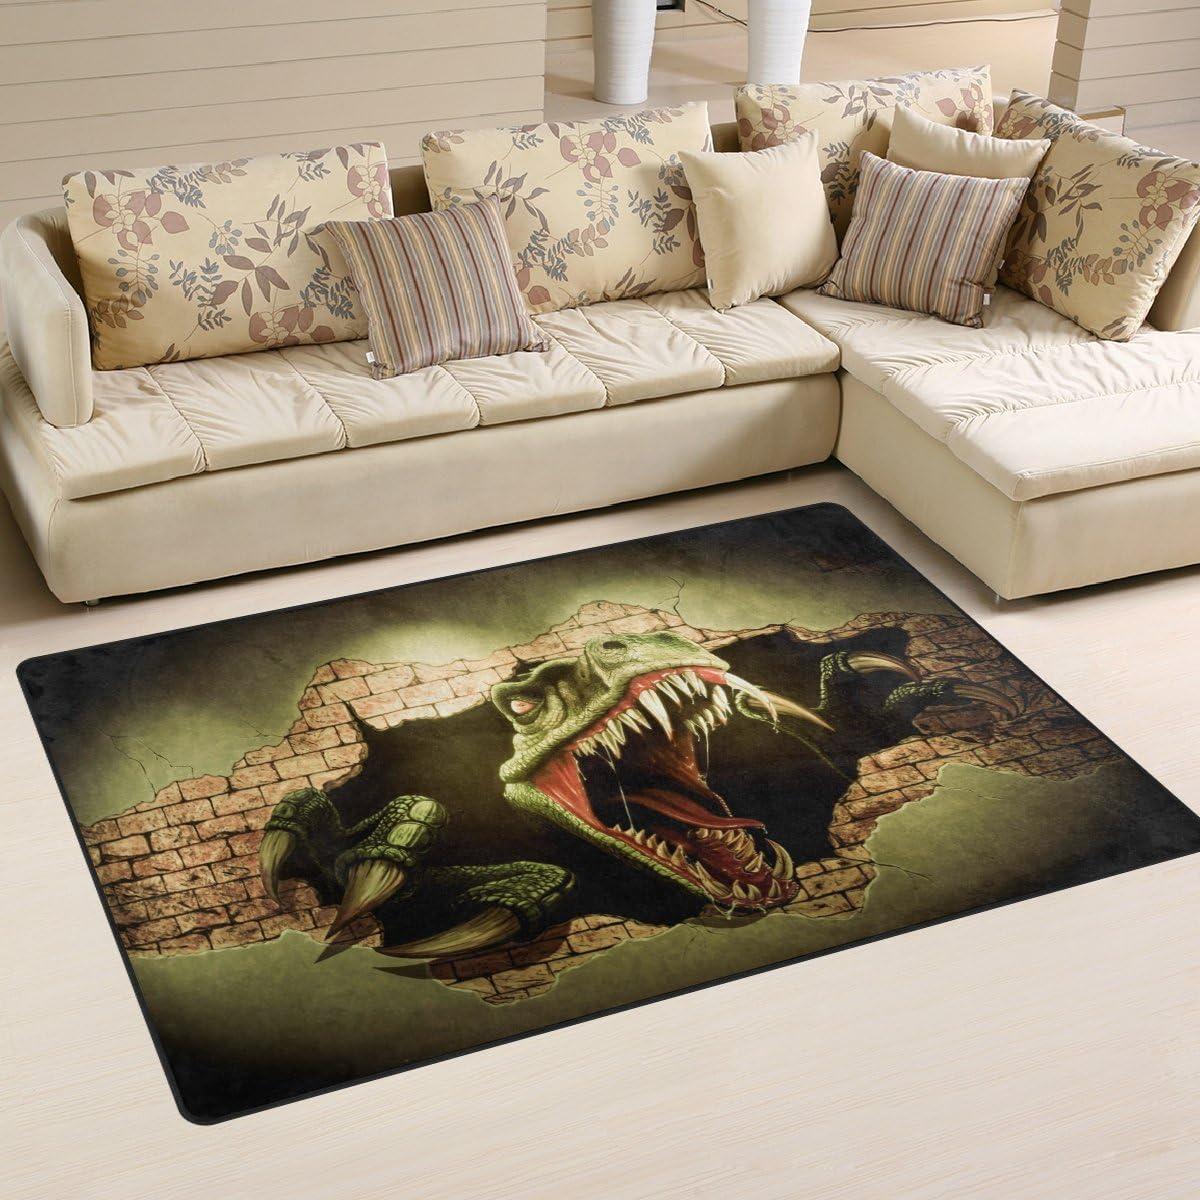 WOZO Fierce Dinosaur Area Rug Rugs Non-Slip Floor Mat Doormat